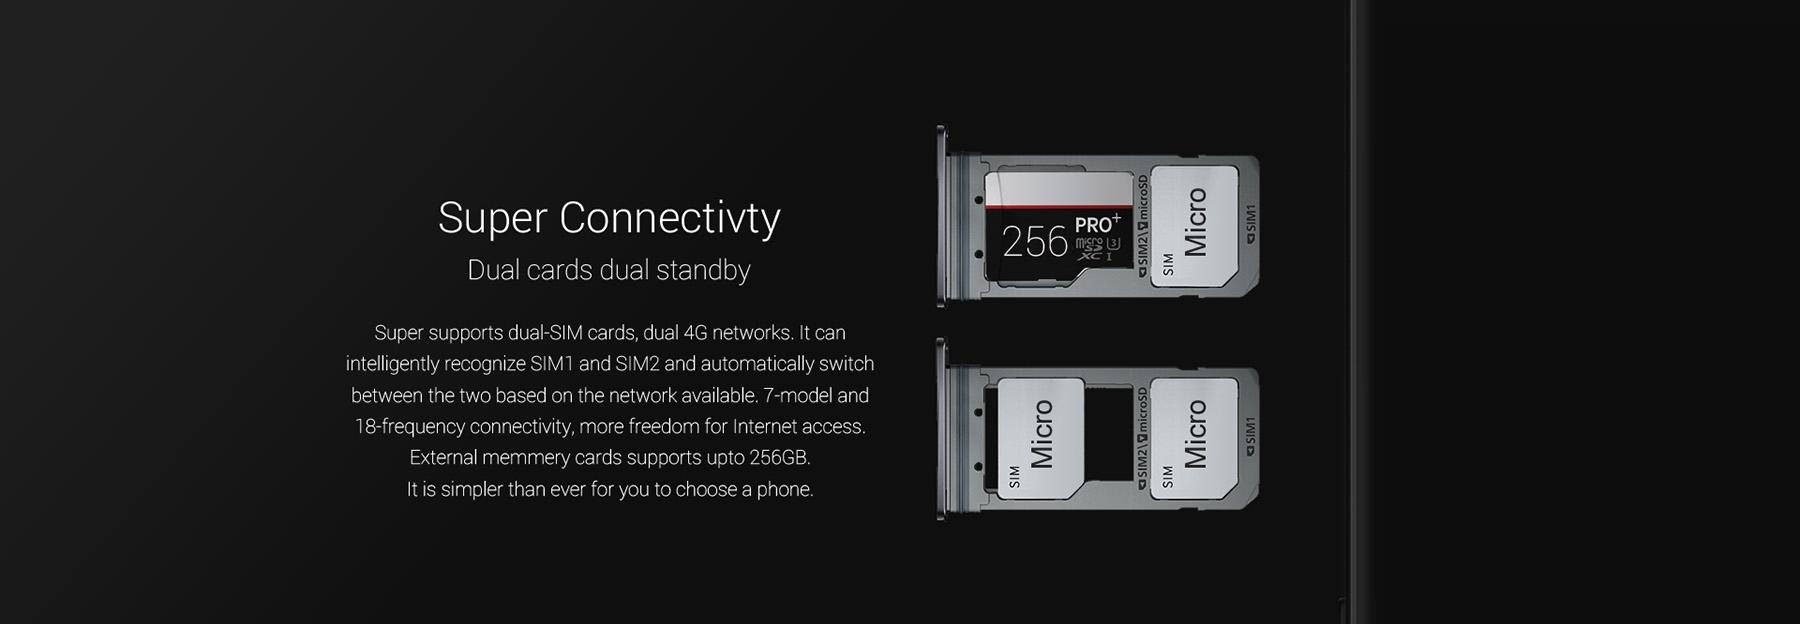 оличество SIM-карт: 2, Dual Standby, Dual 4G LTE